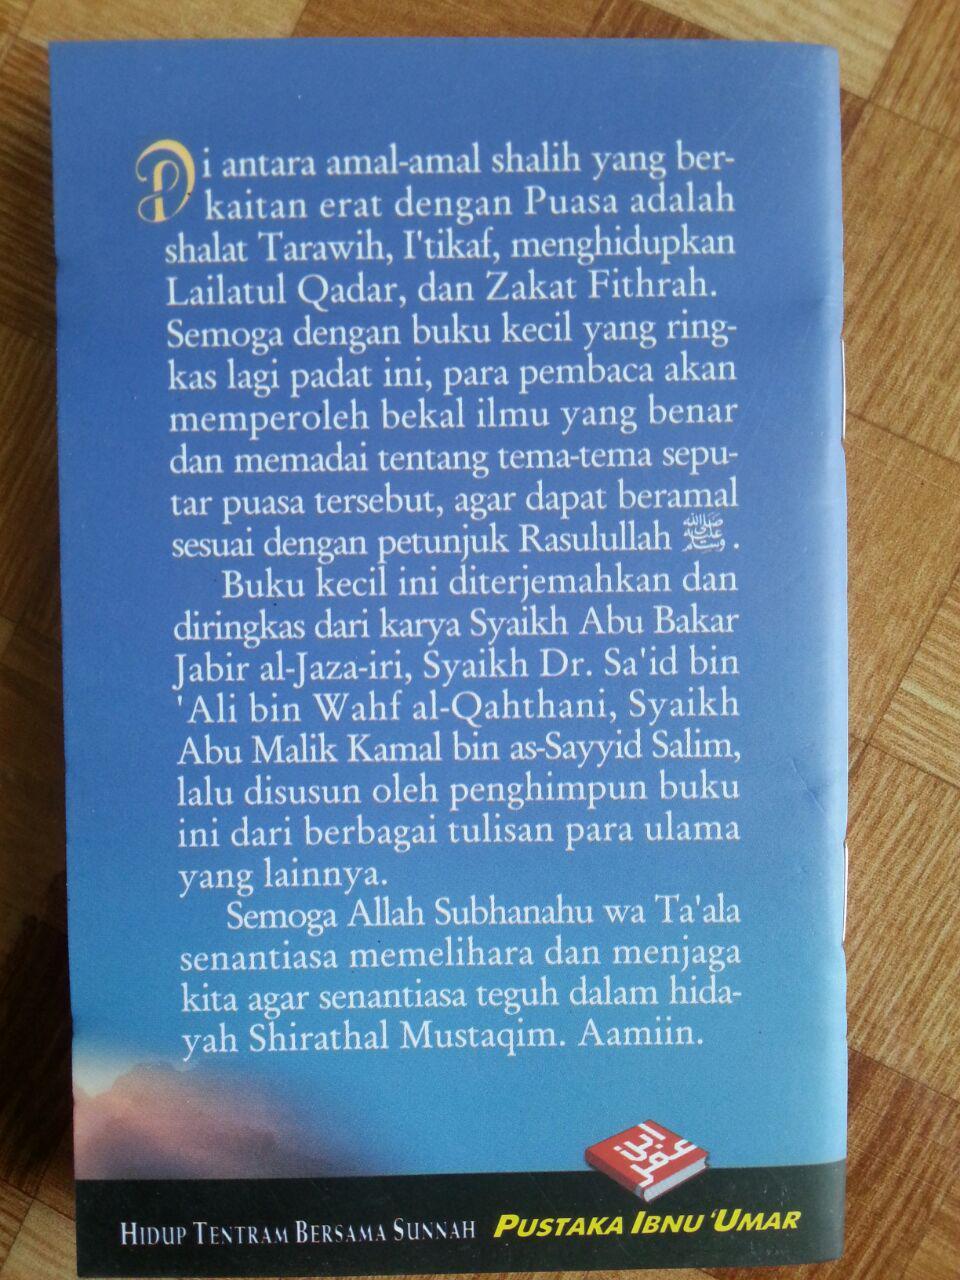 Buku Saku Tuntunan Praktis Puasa Tarawih I'tikaf Lailatul Qadar dan Zakat Fitrah cover